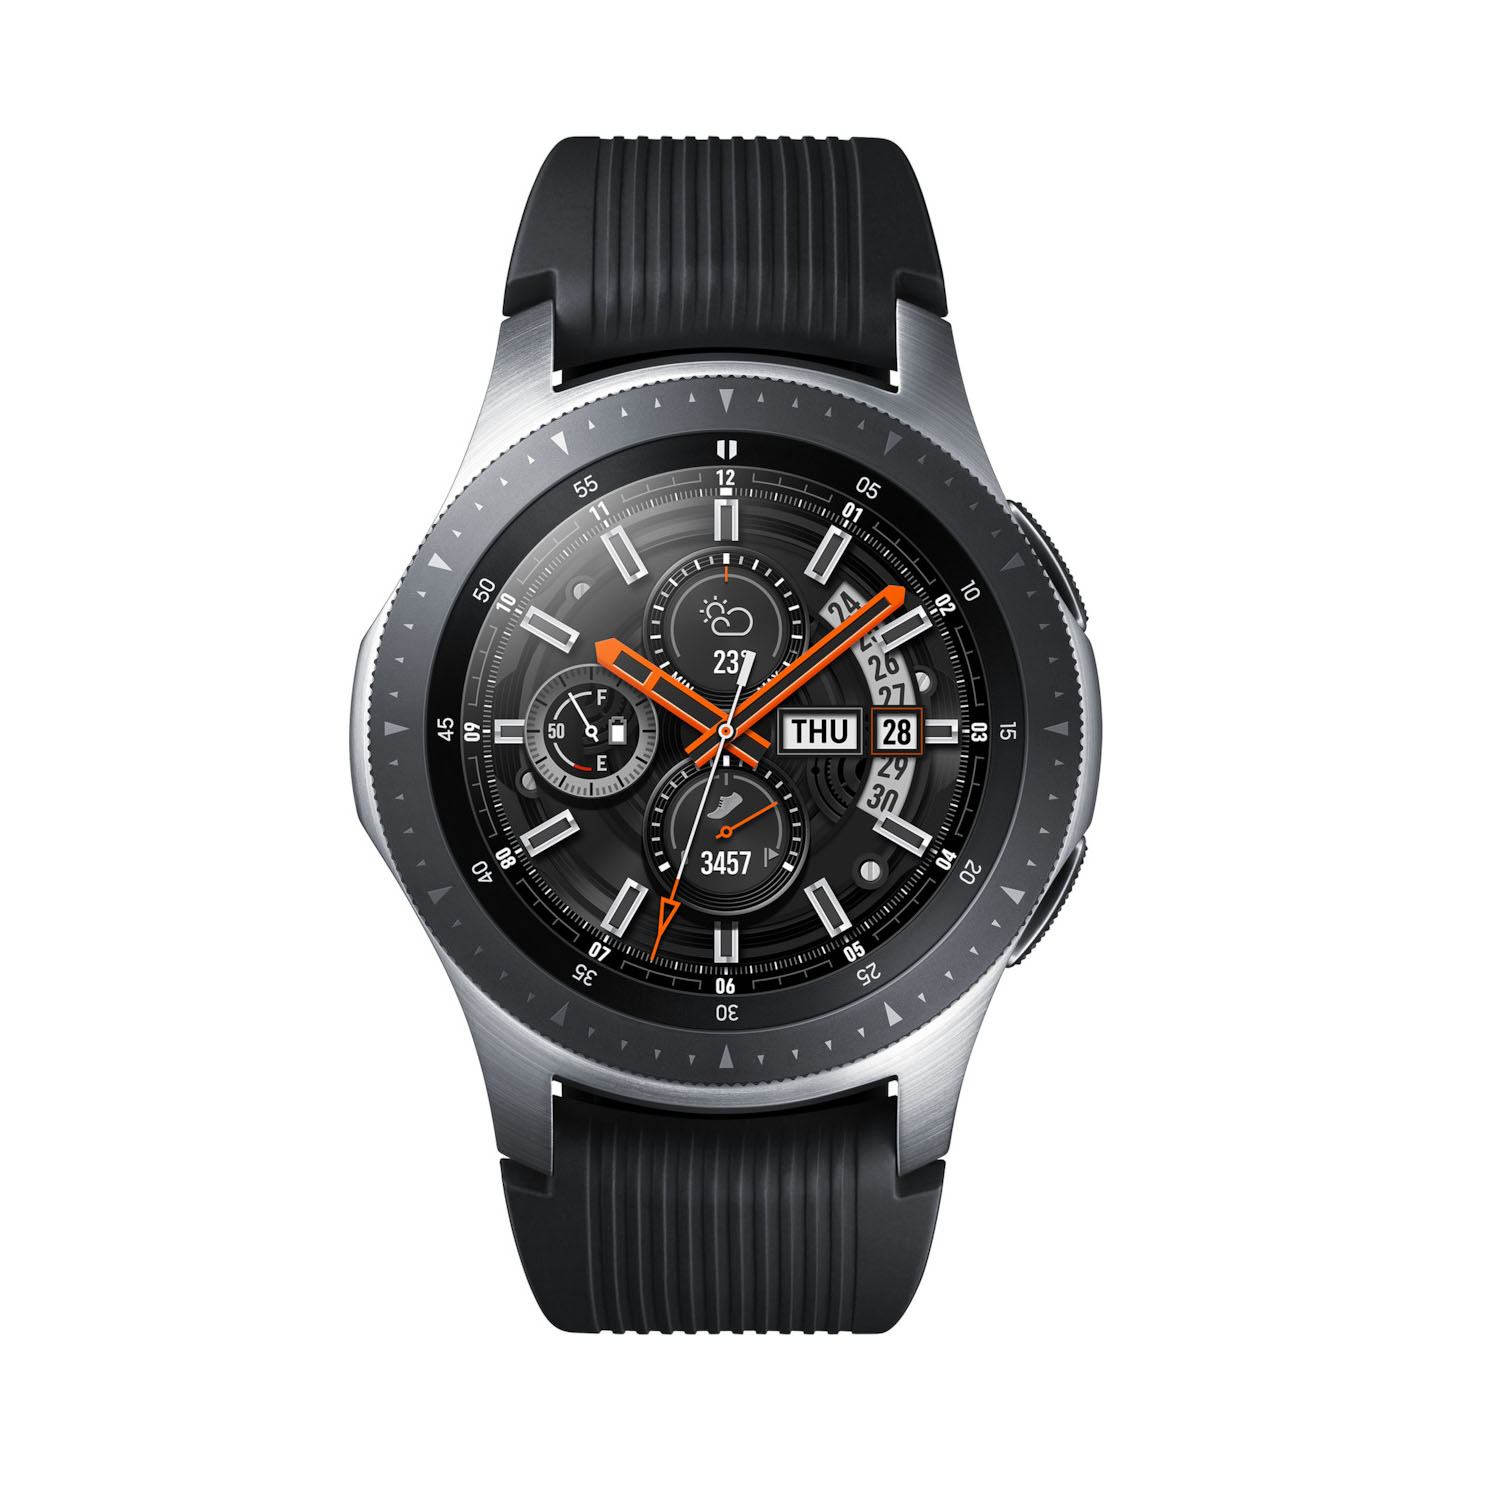 Samsung Galaxy Watch 46mm SM-R800 Silver Πληρωμή έως 24 δόσεις